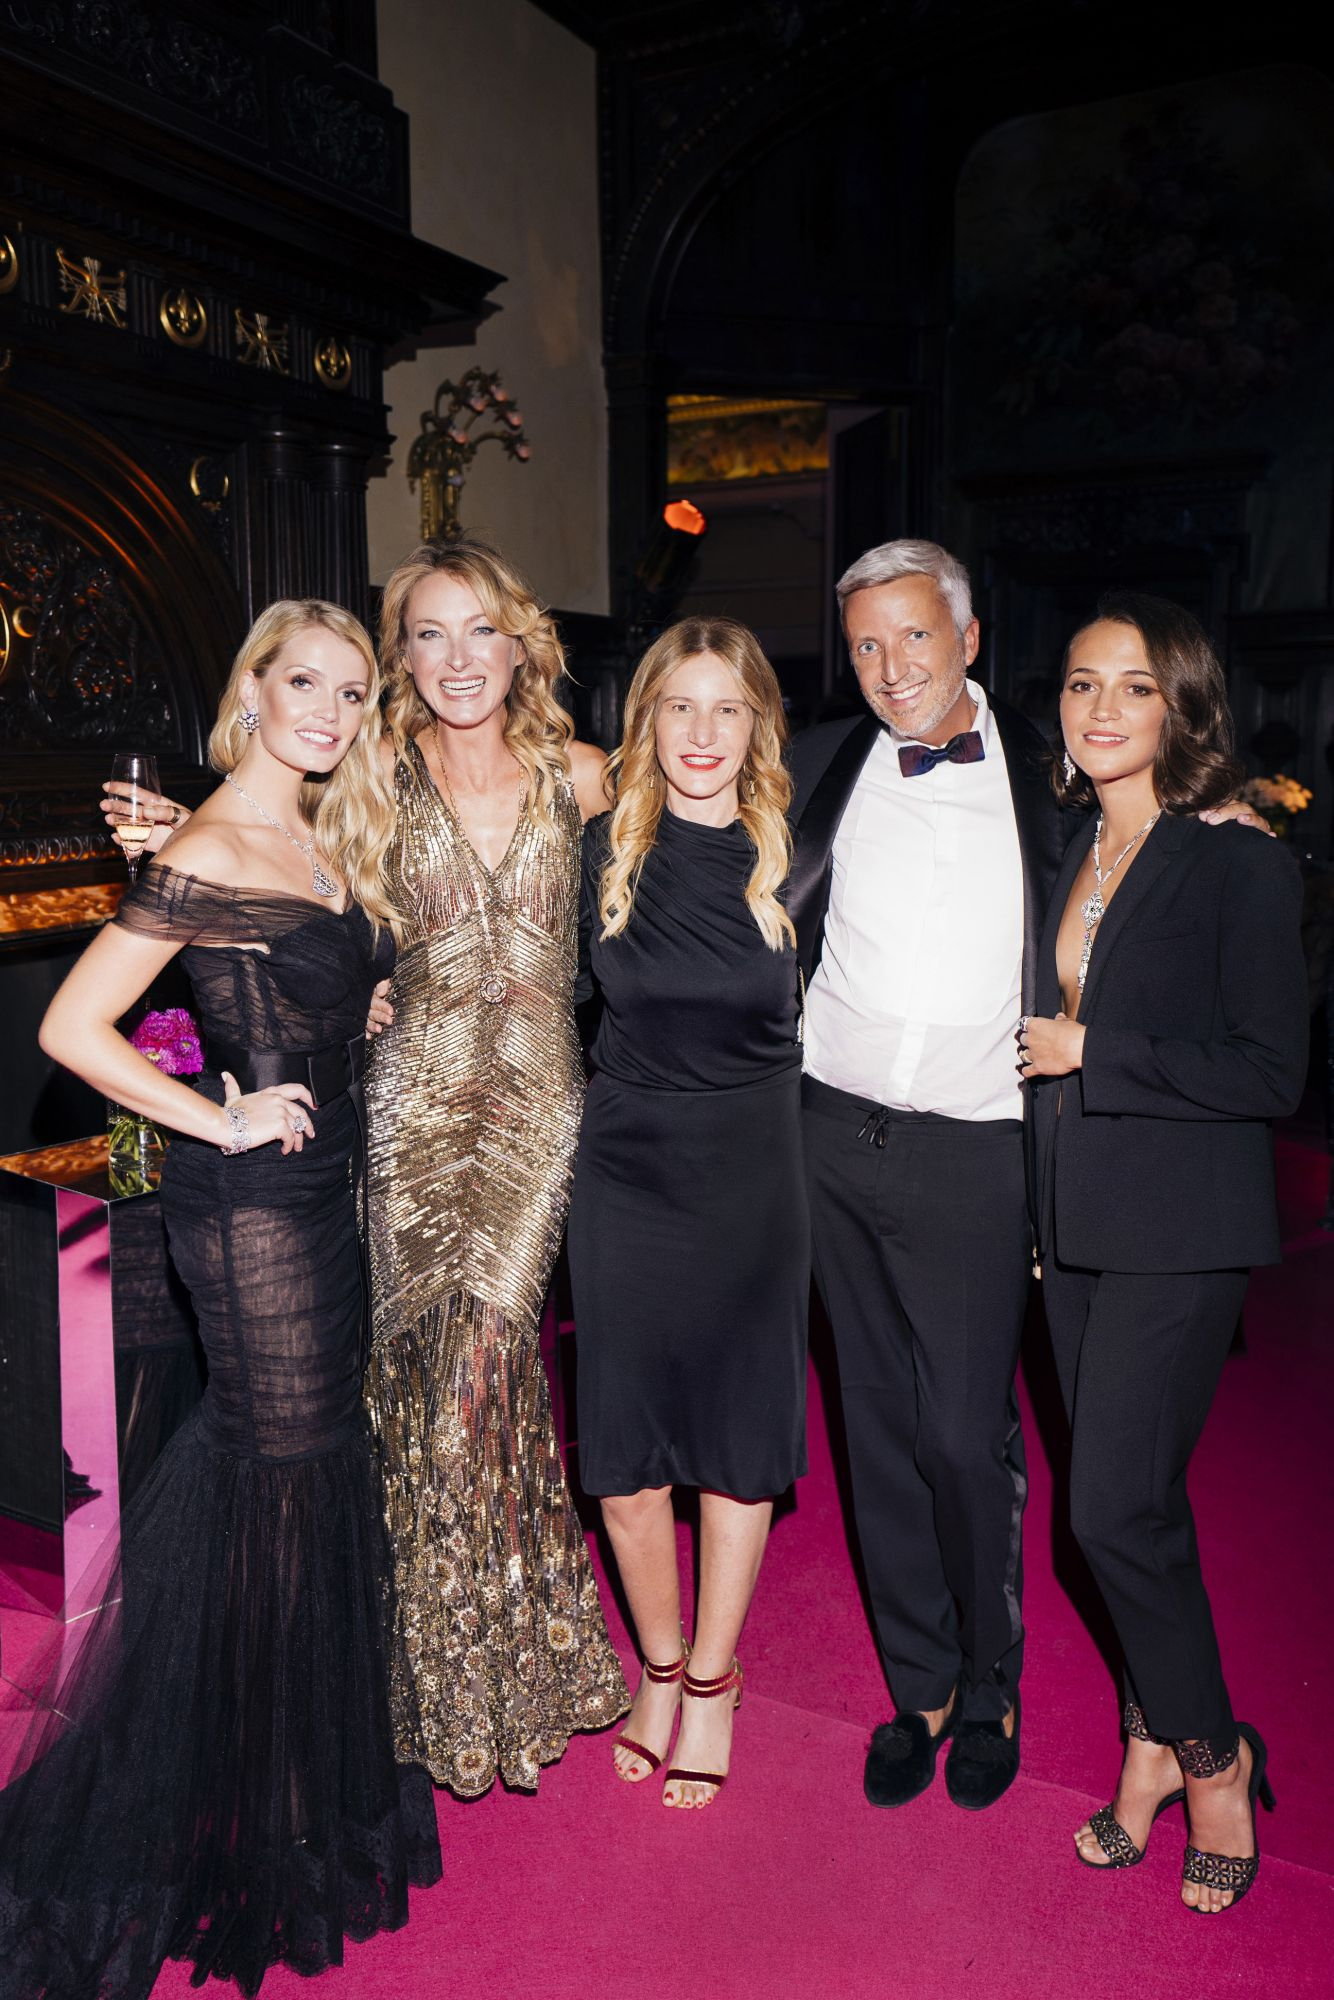 Kitty Spencer, Lilly Wittgenstein, Elisabetta Marra, Steven Walberg, Alicia Vikander